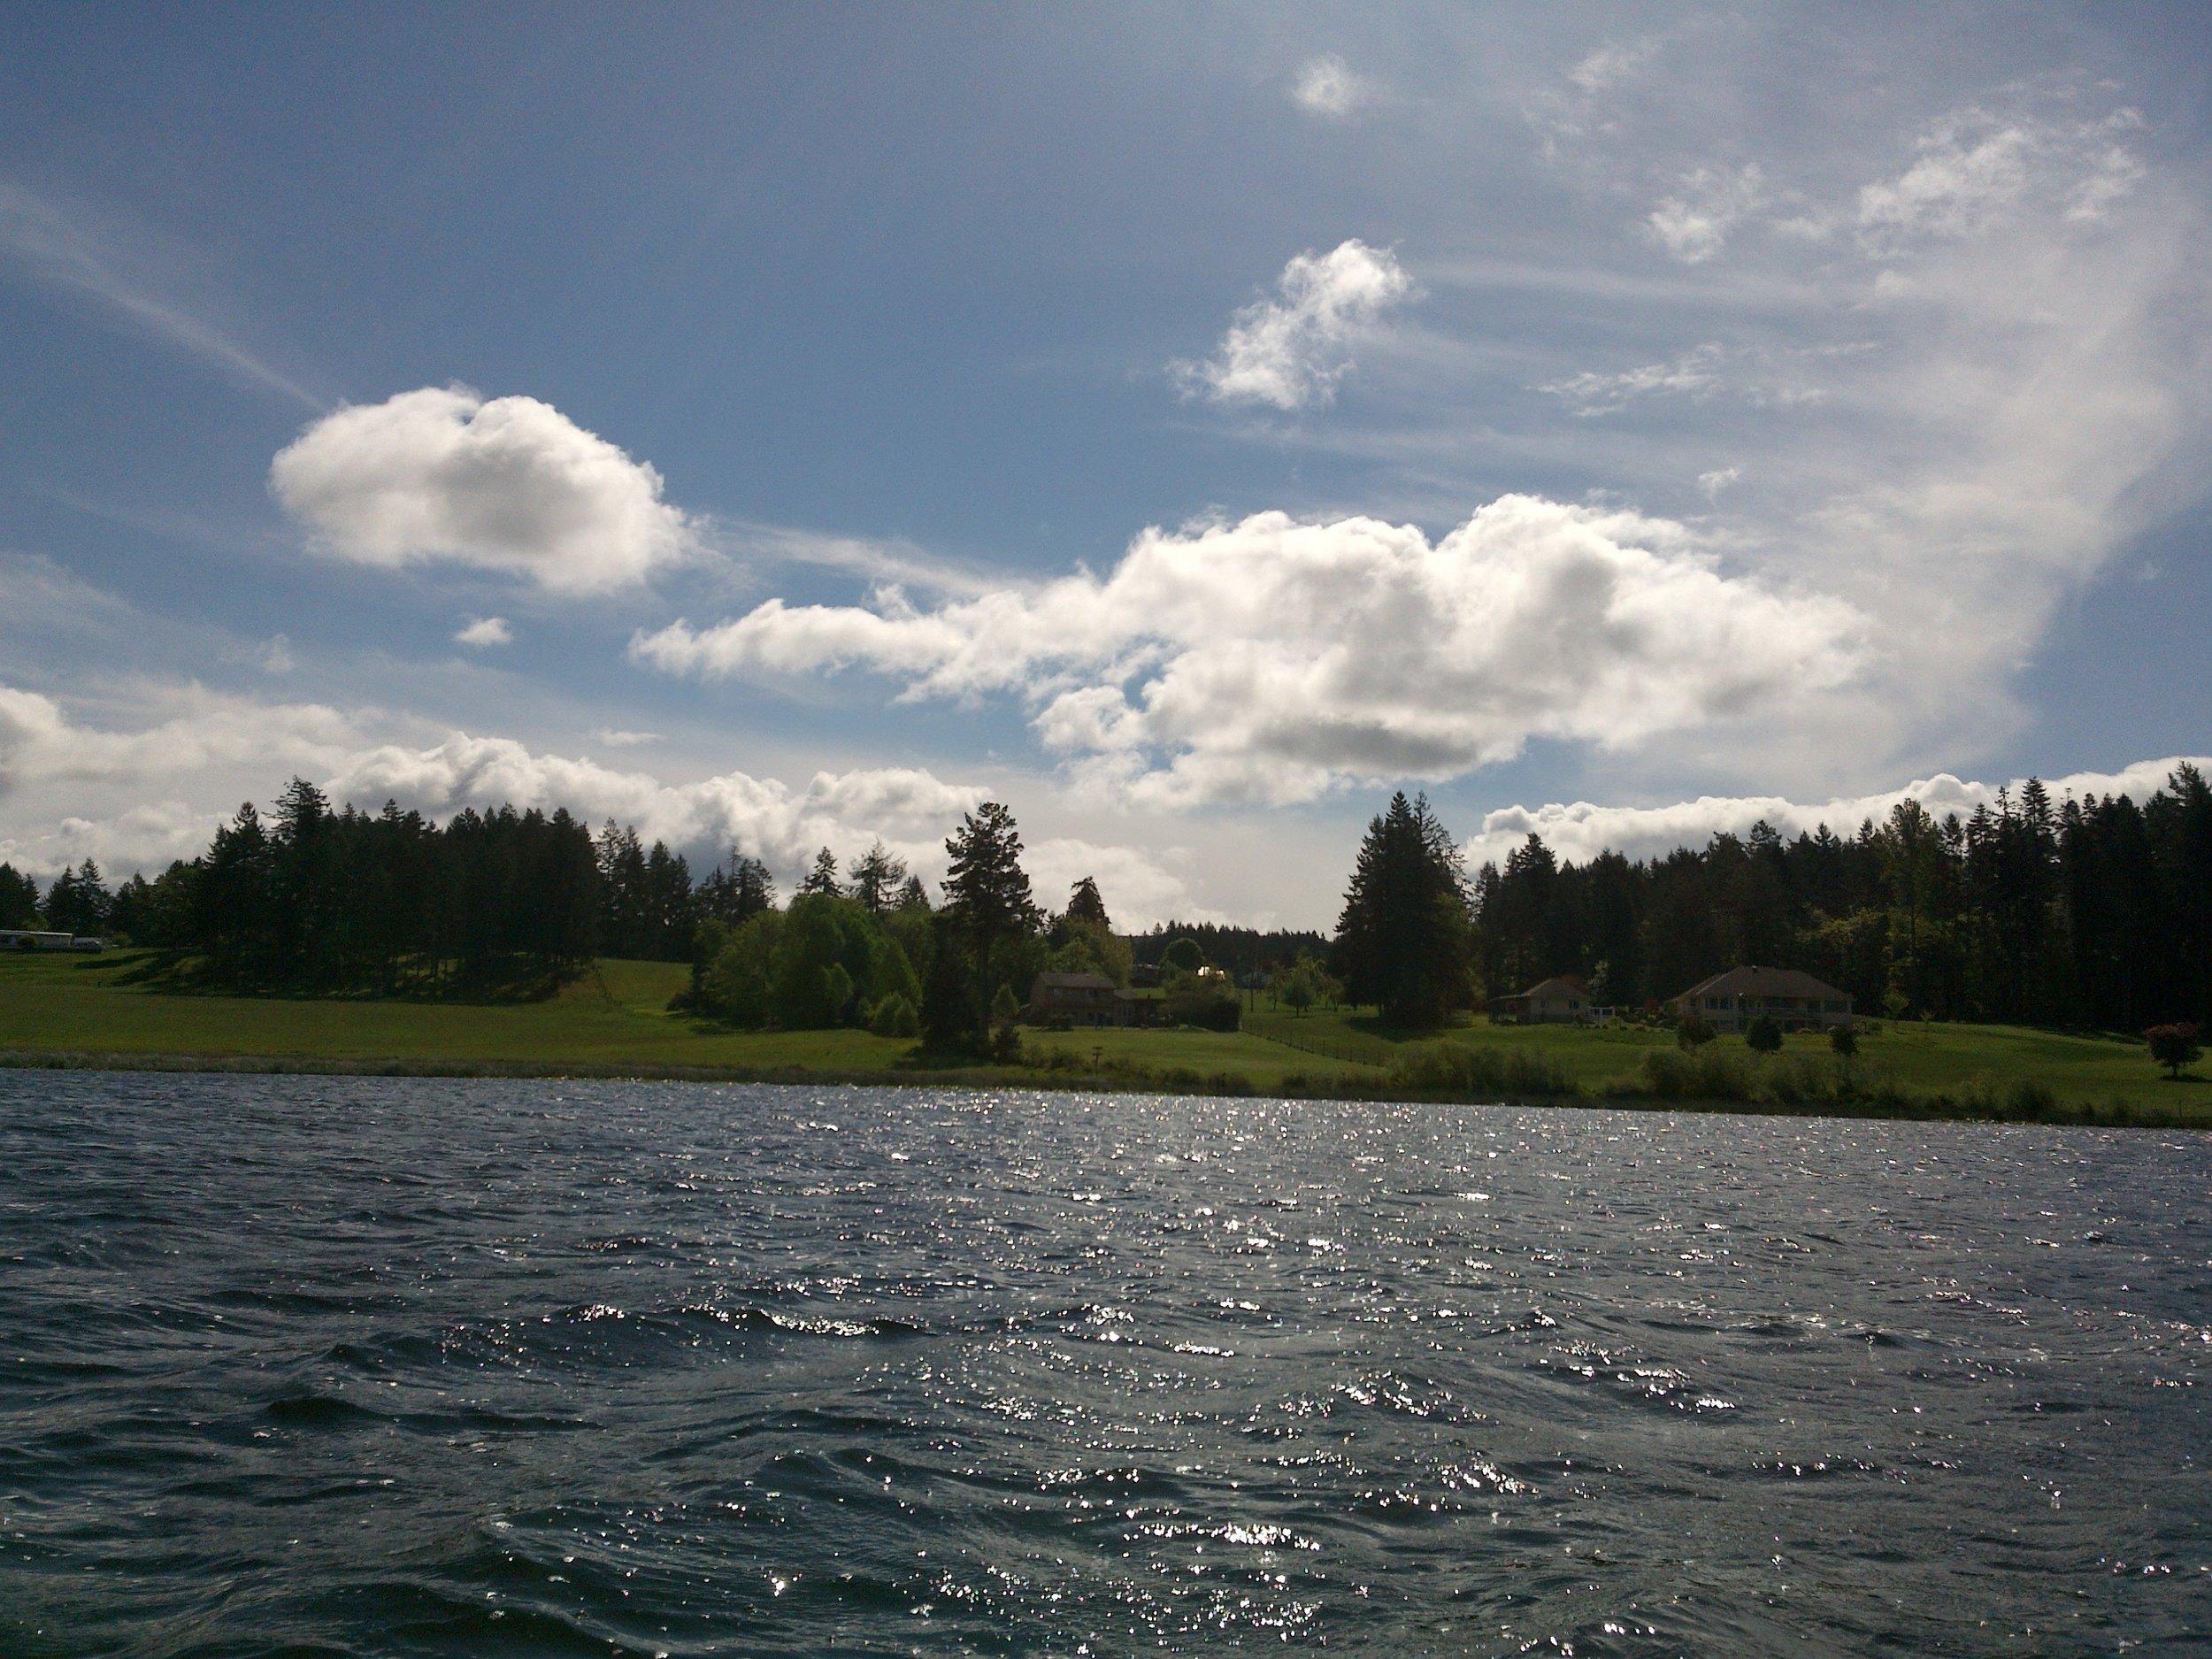 Somenos Lake with lakefront properties 2015 - Photo by Elizabeth Aitken